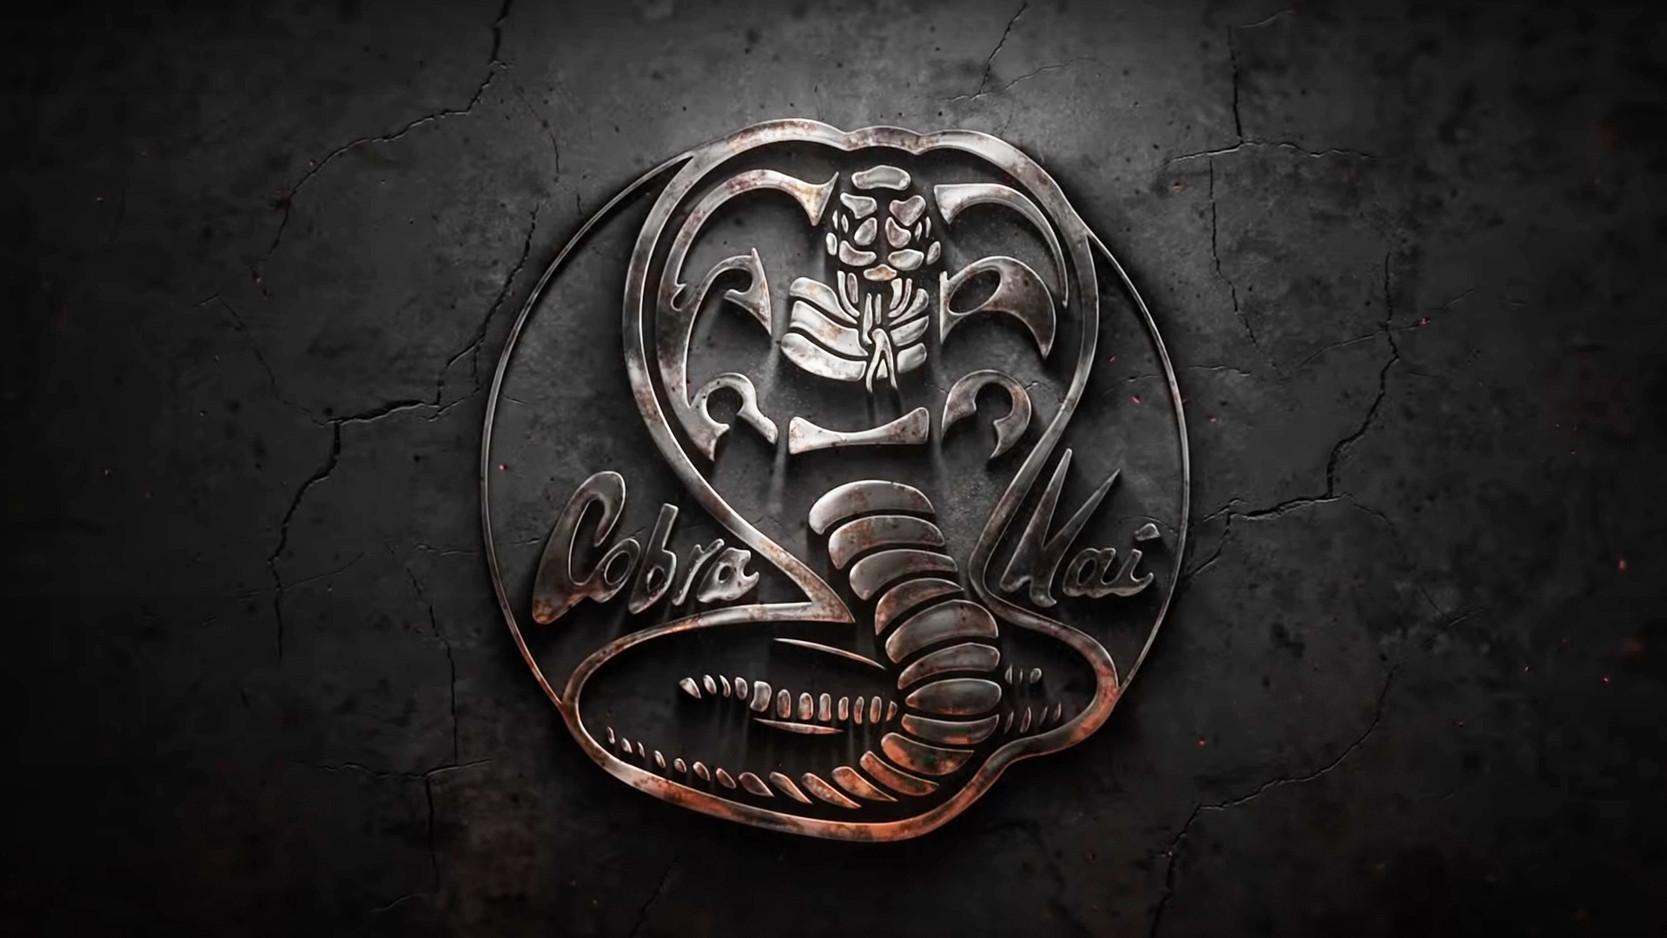 Cobra Kai Karate Prank Promo